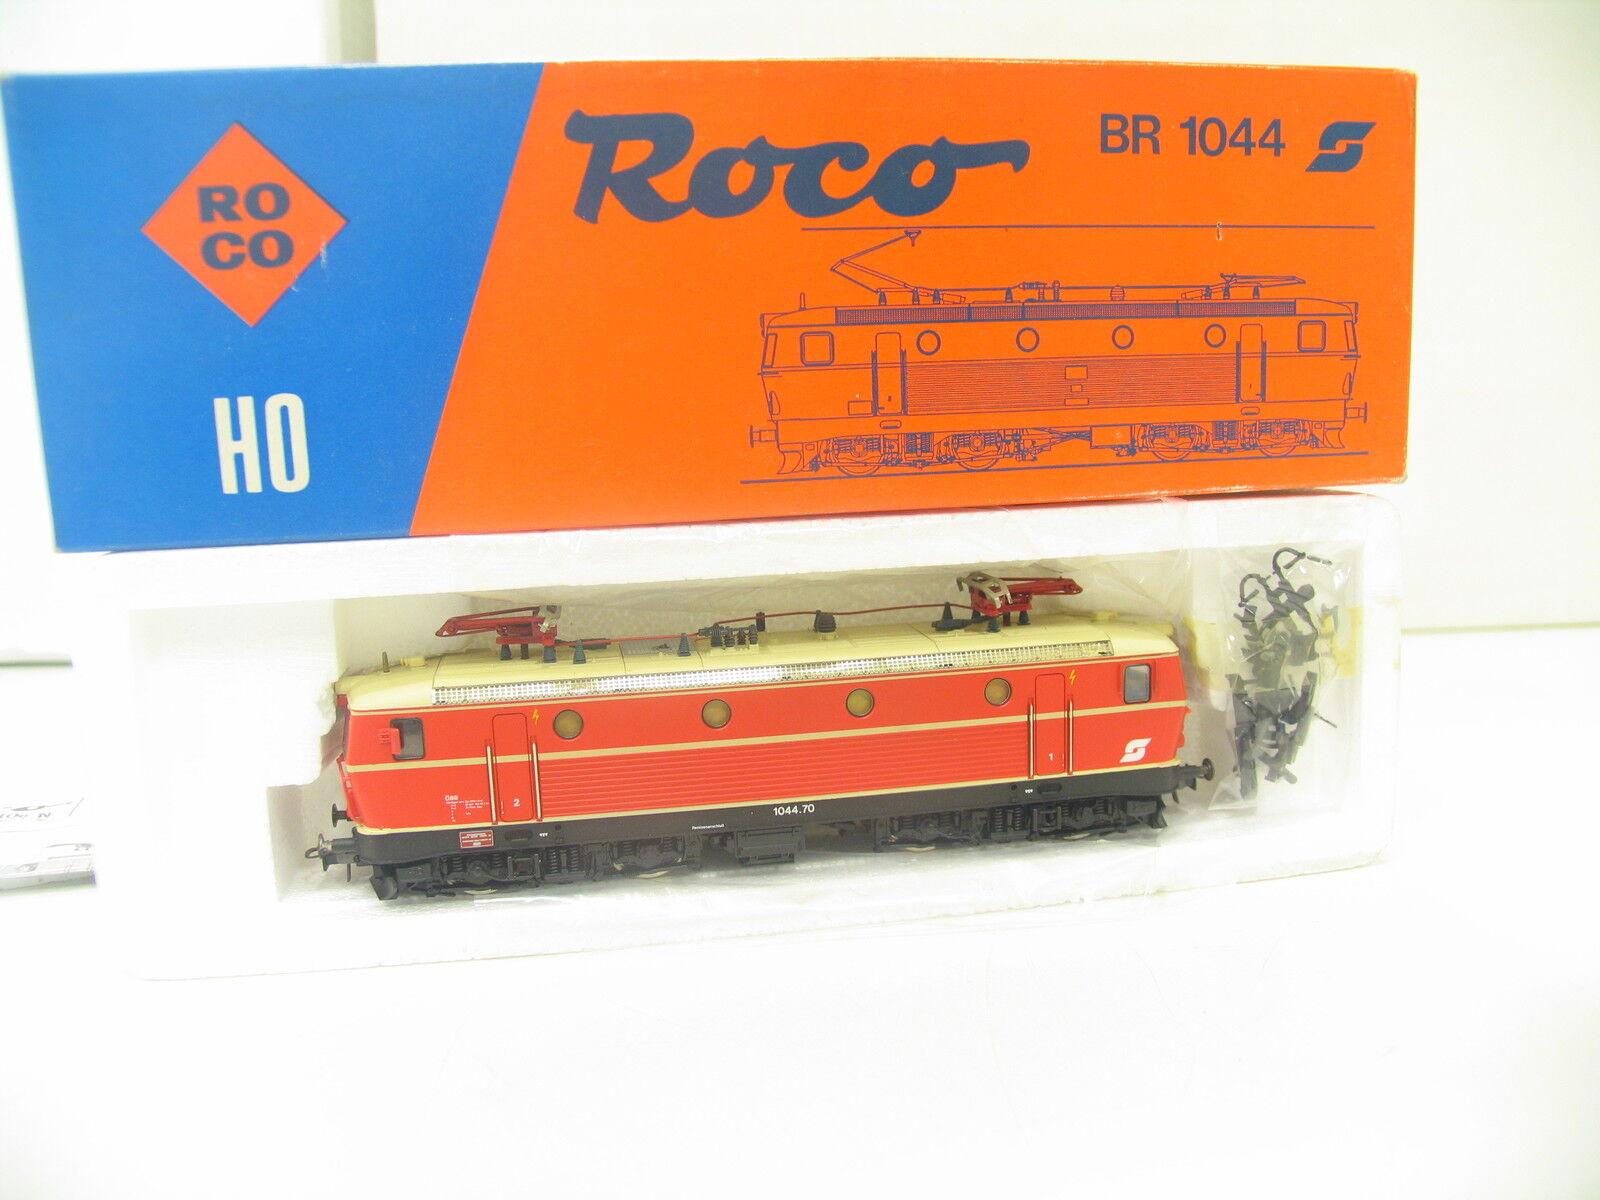 Roco 43515 E-LOK BR 1044.70 orange der ÖBB bw1305